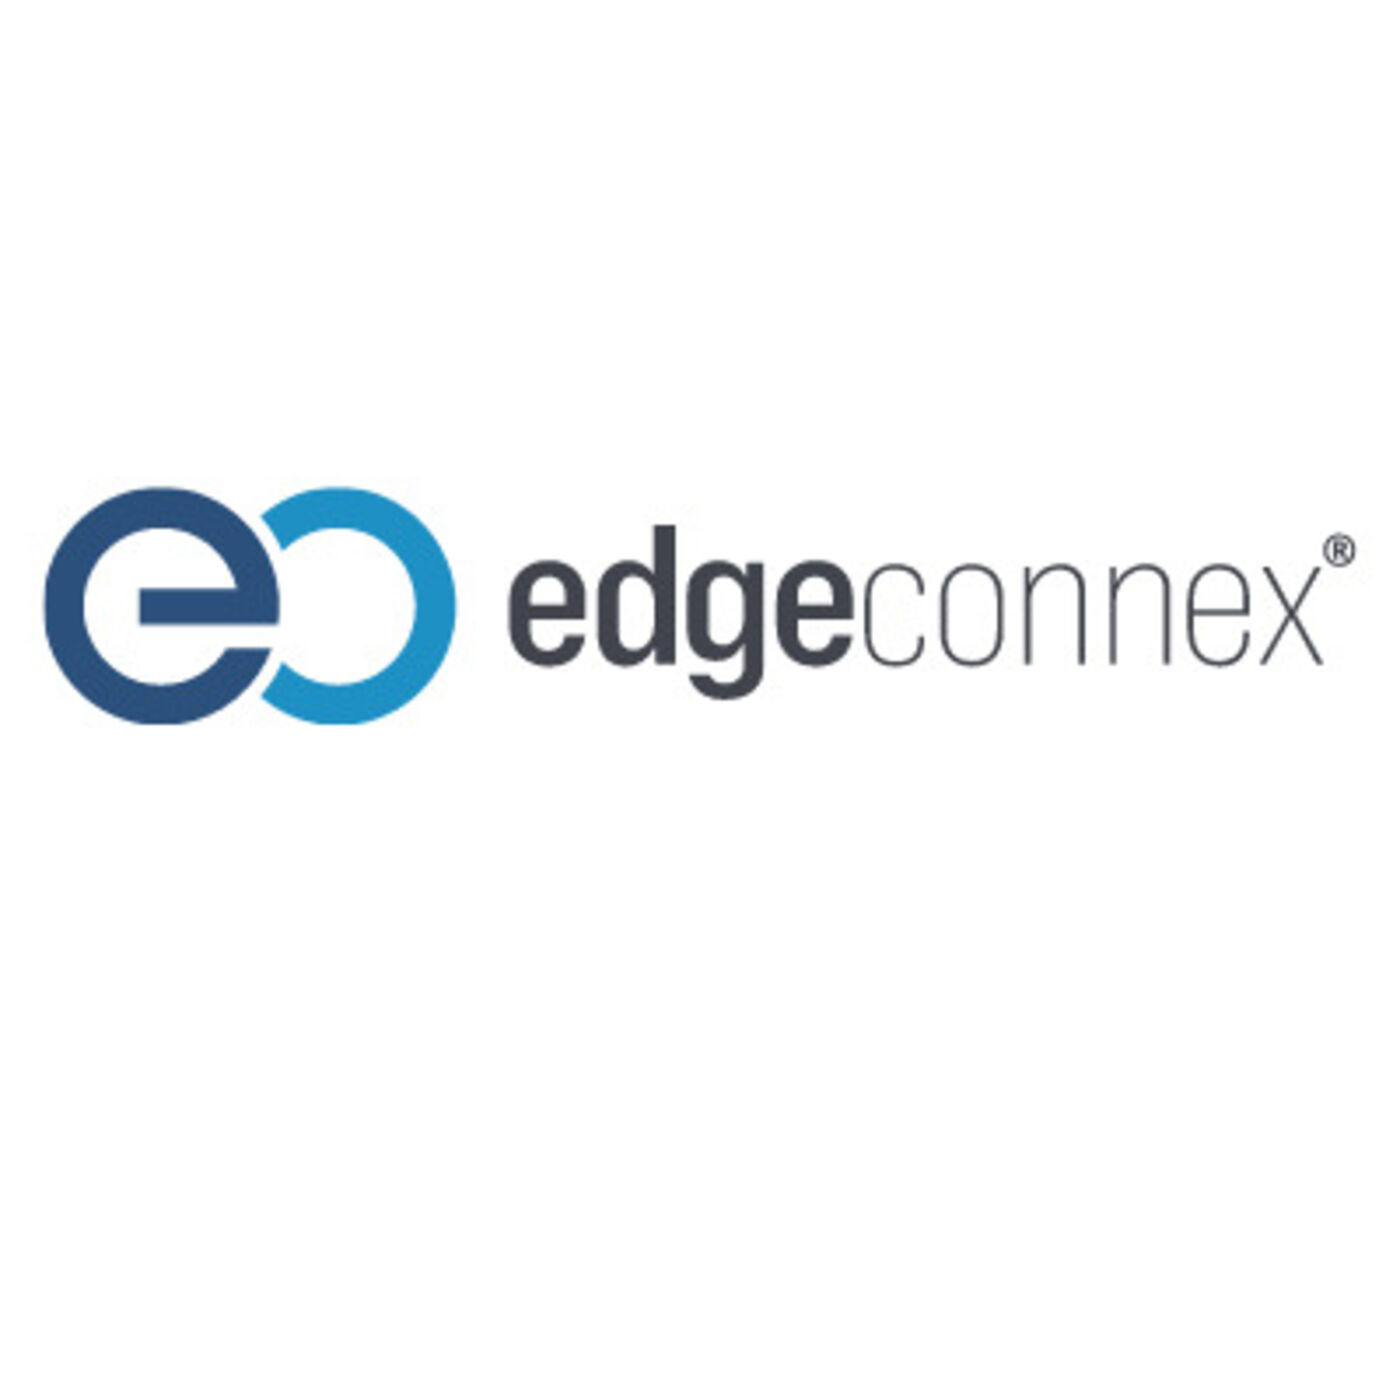 JSA TV interview with Phillip Marangella, CMO of EdgeConneX - The Home Is The New Edge